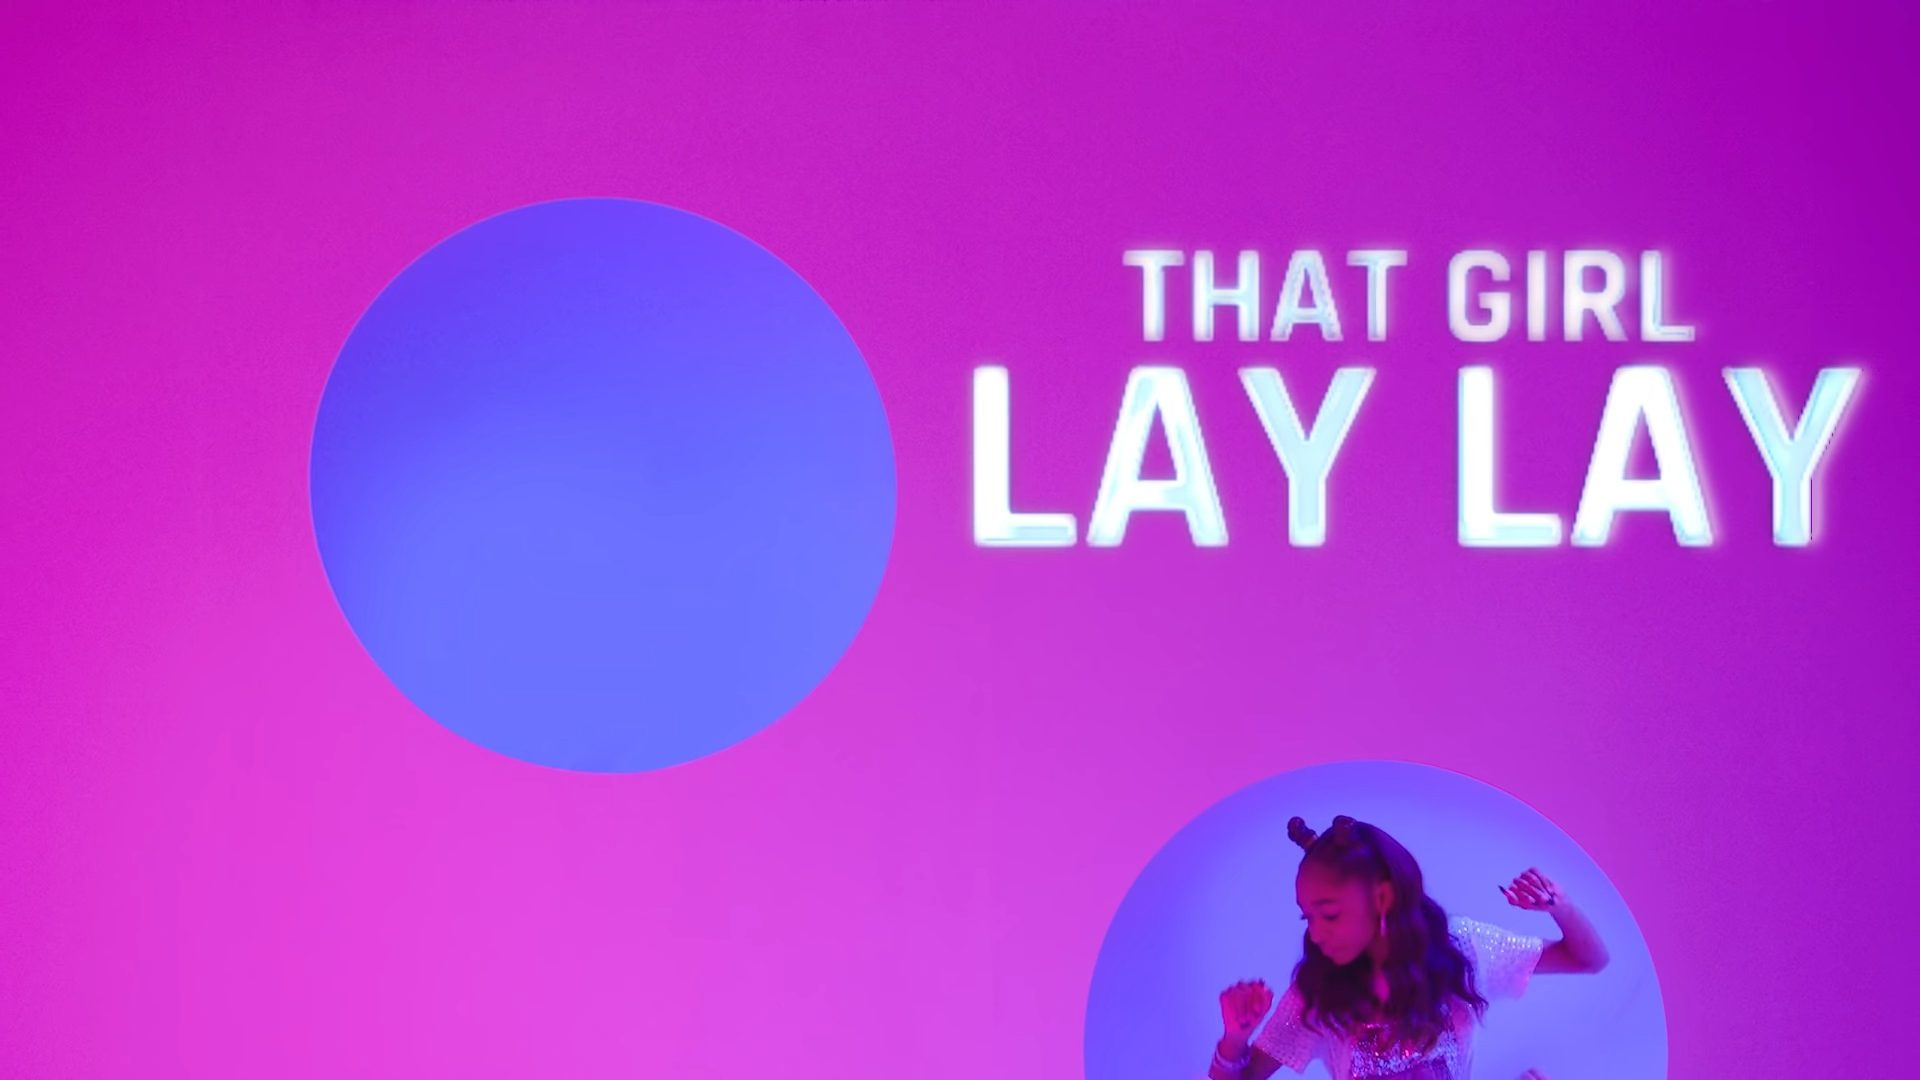 That Girl Lay Lay Season 1 release date